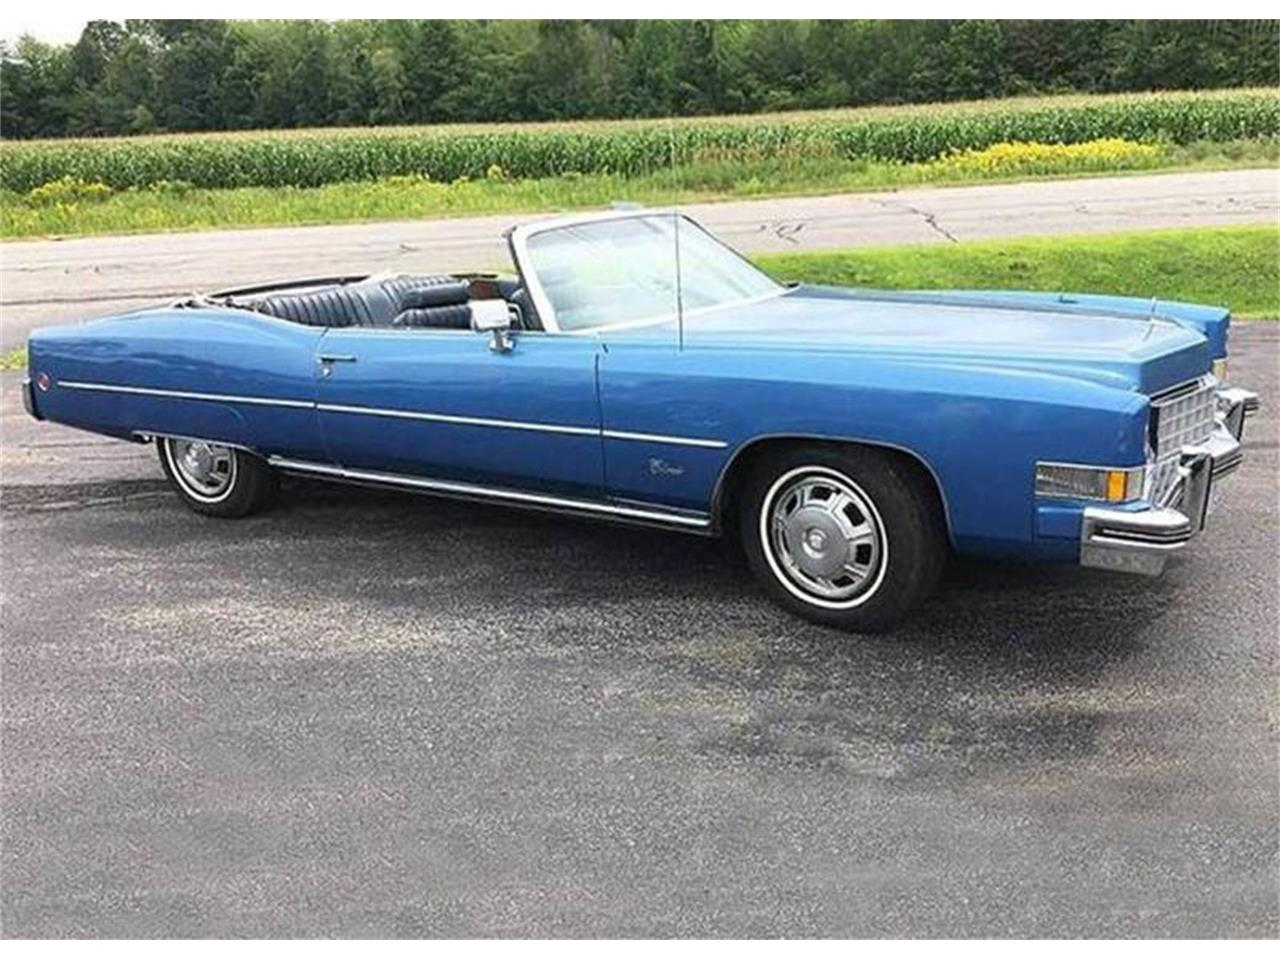 New Cadillac Eldorado >> For Sale 1973 Cadillac Eldorado In Malone New York